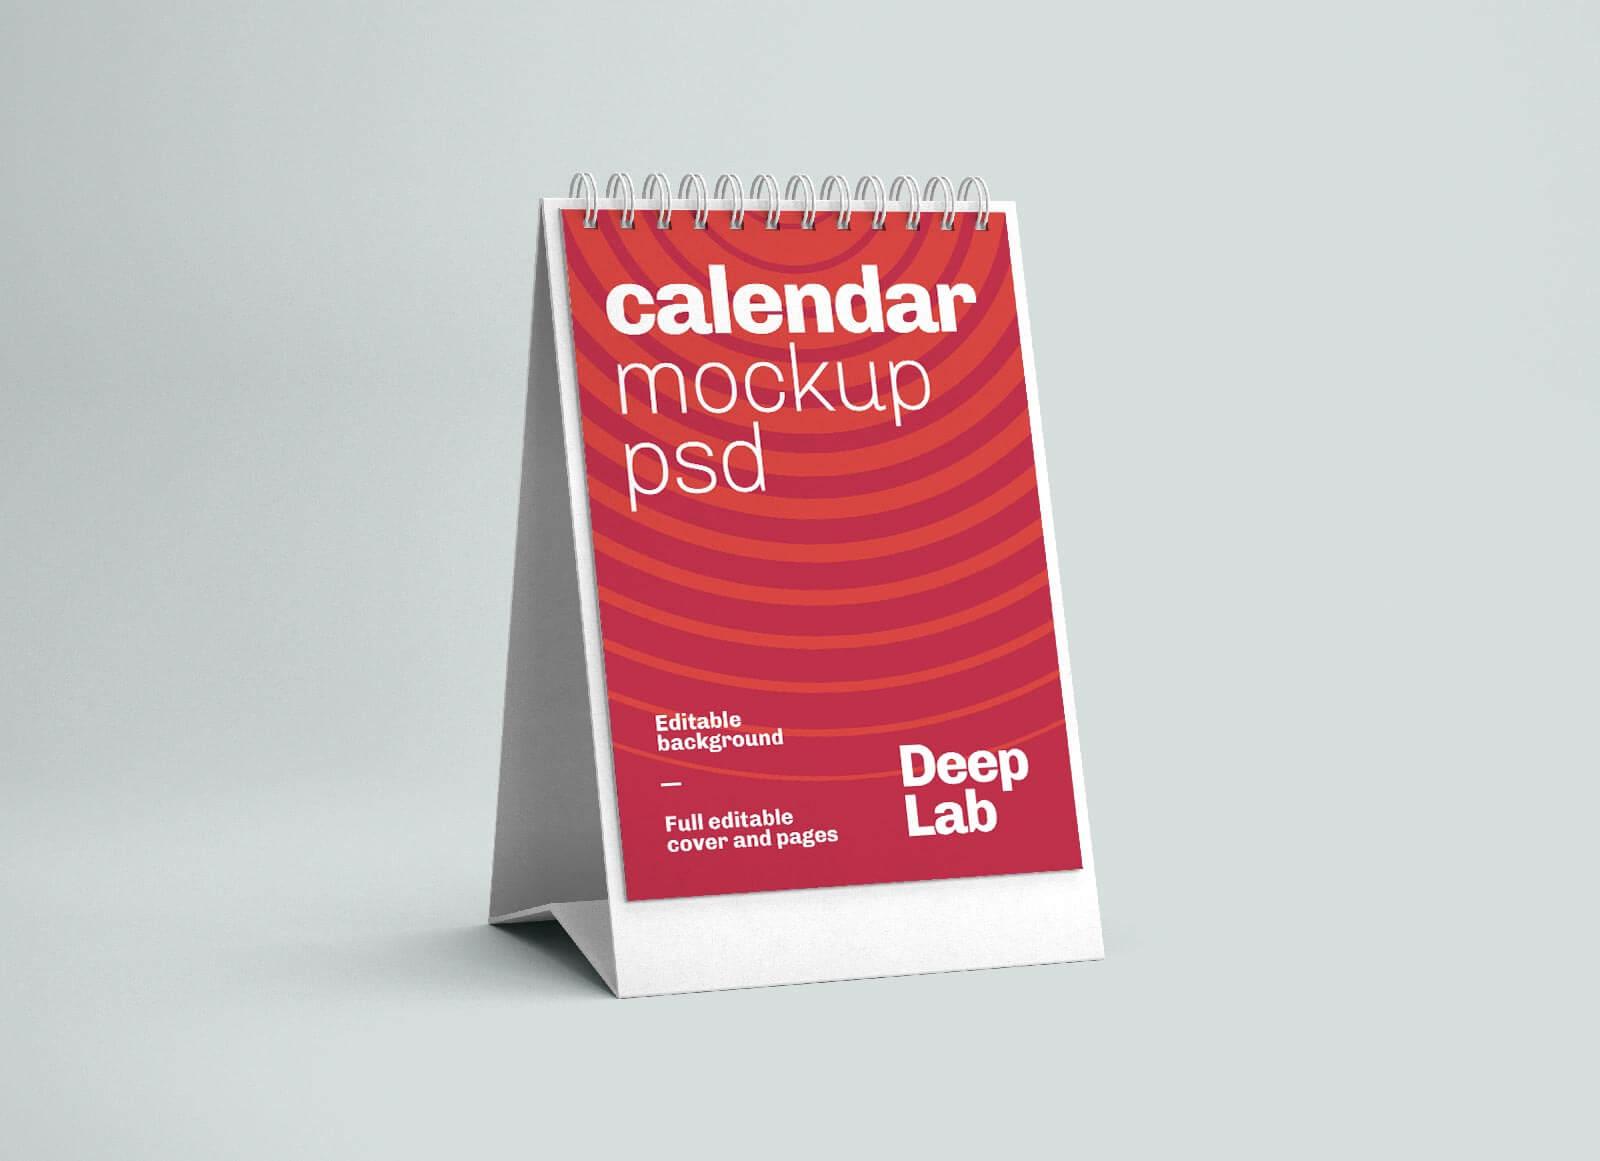 Free Vertical Desk Calendar 2022 Mockup PSD (5)